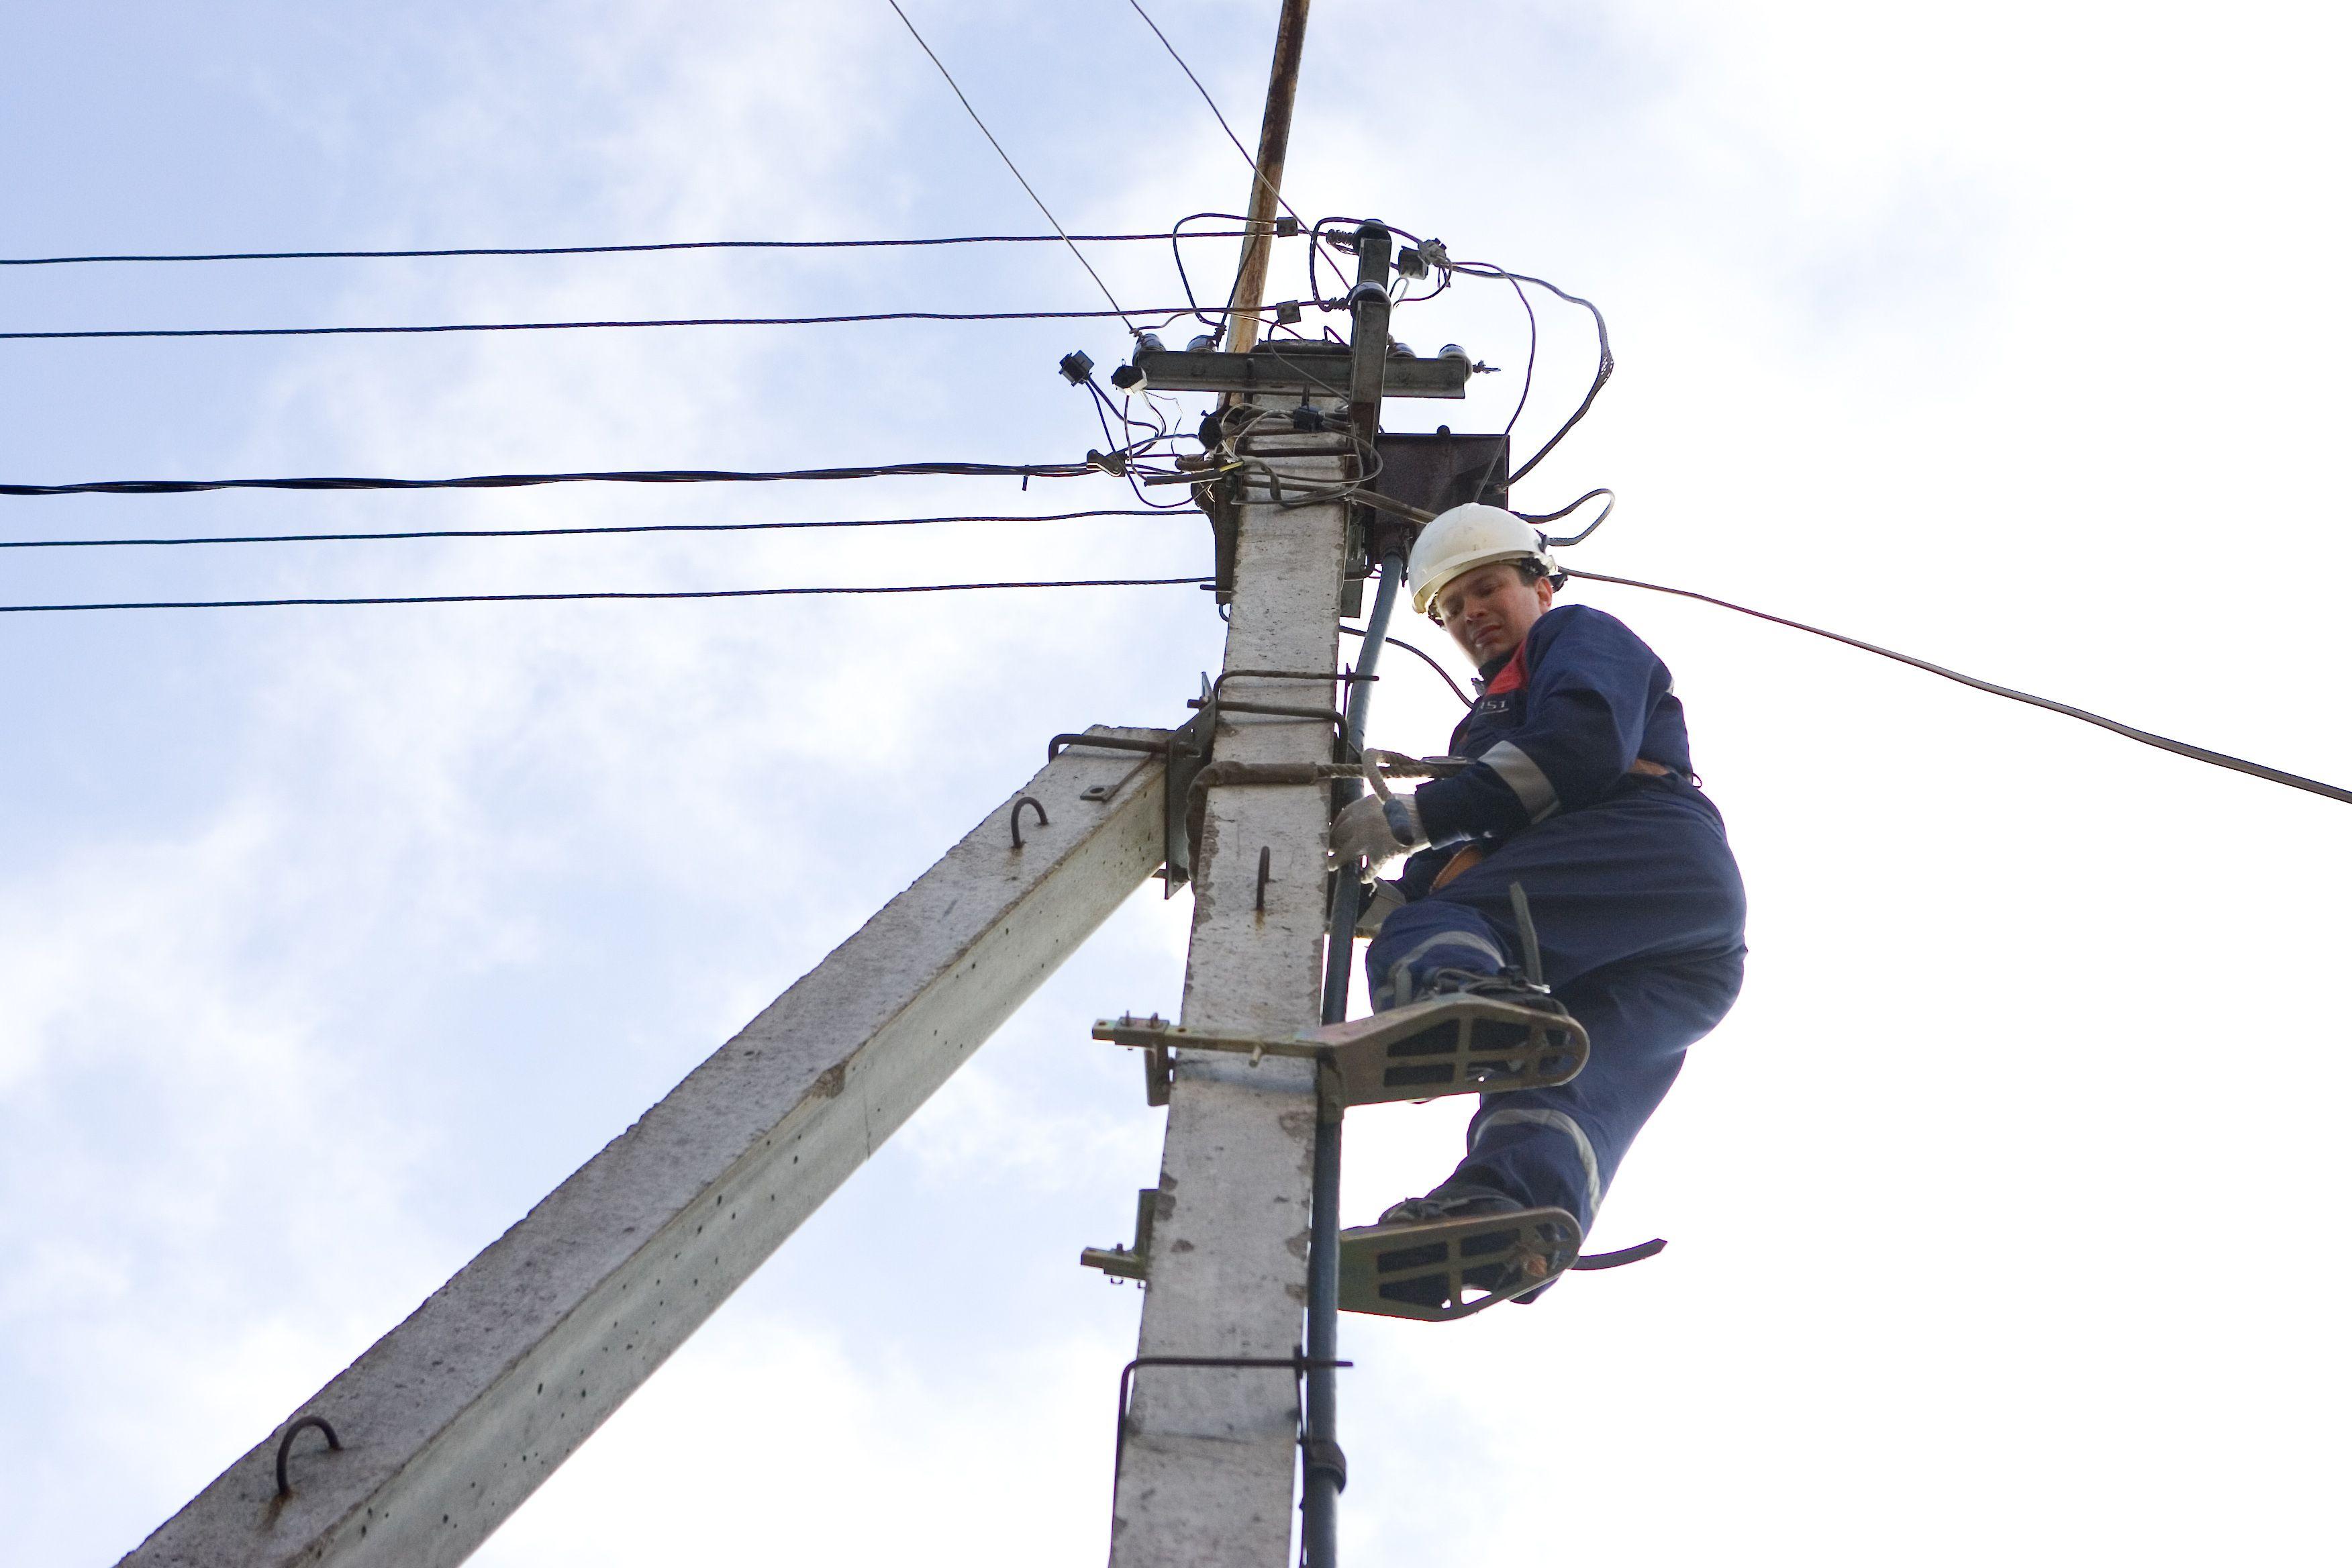 Konkurencija apkarto: si�lo privatizuoti valstybines elektros montavimo �mones